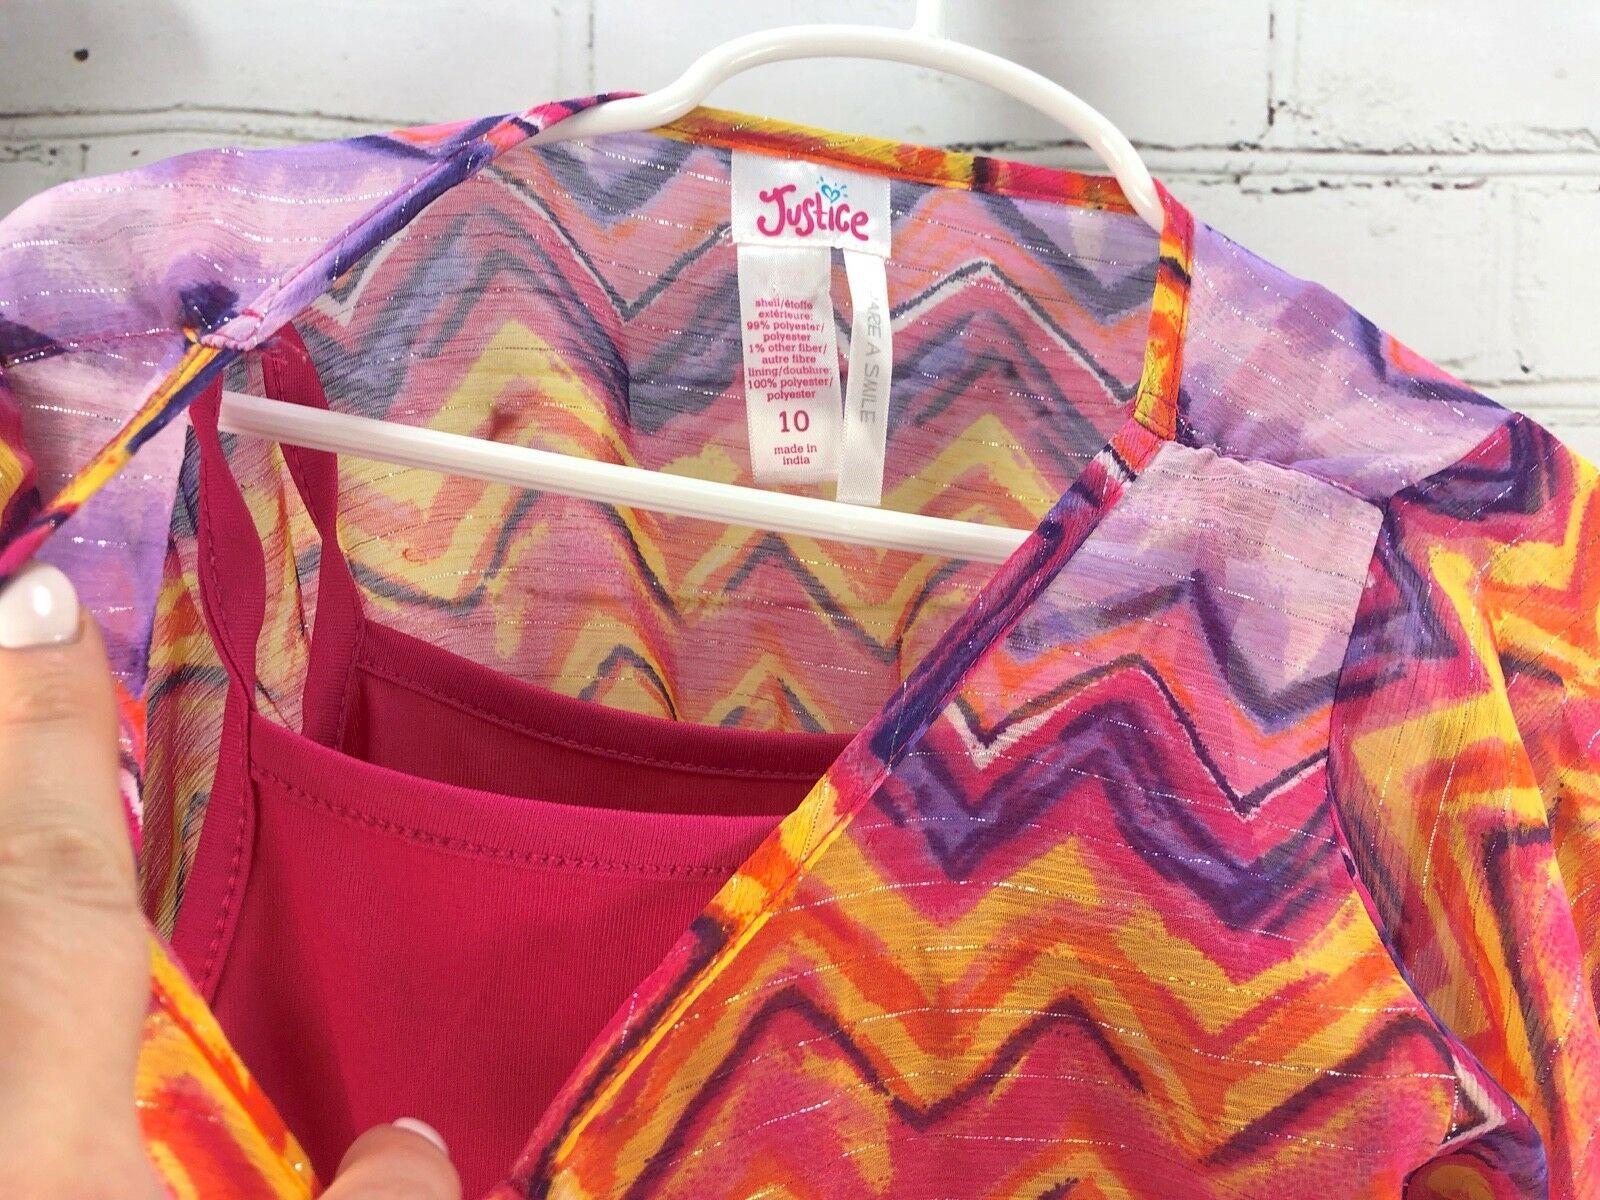 Justice Outfit Set - Boho Flowing Loose Poncho Top + Jean Skirt Skort Sz 10 image 9